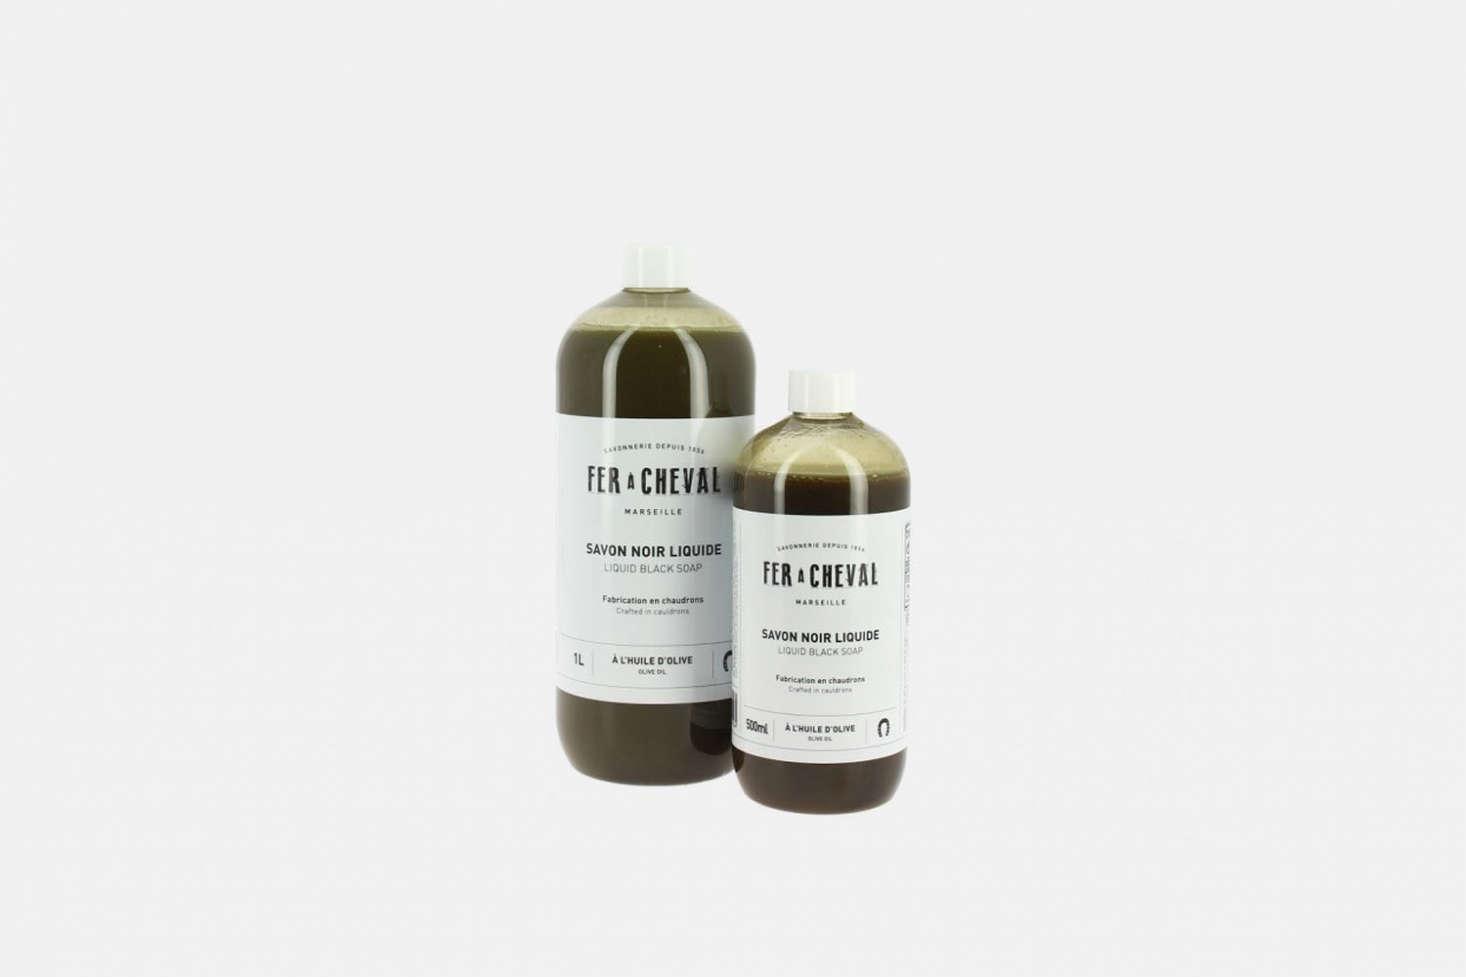 Another solution from Fer à Cheval, theSavon Noir Liquide (&#8